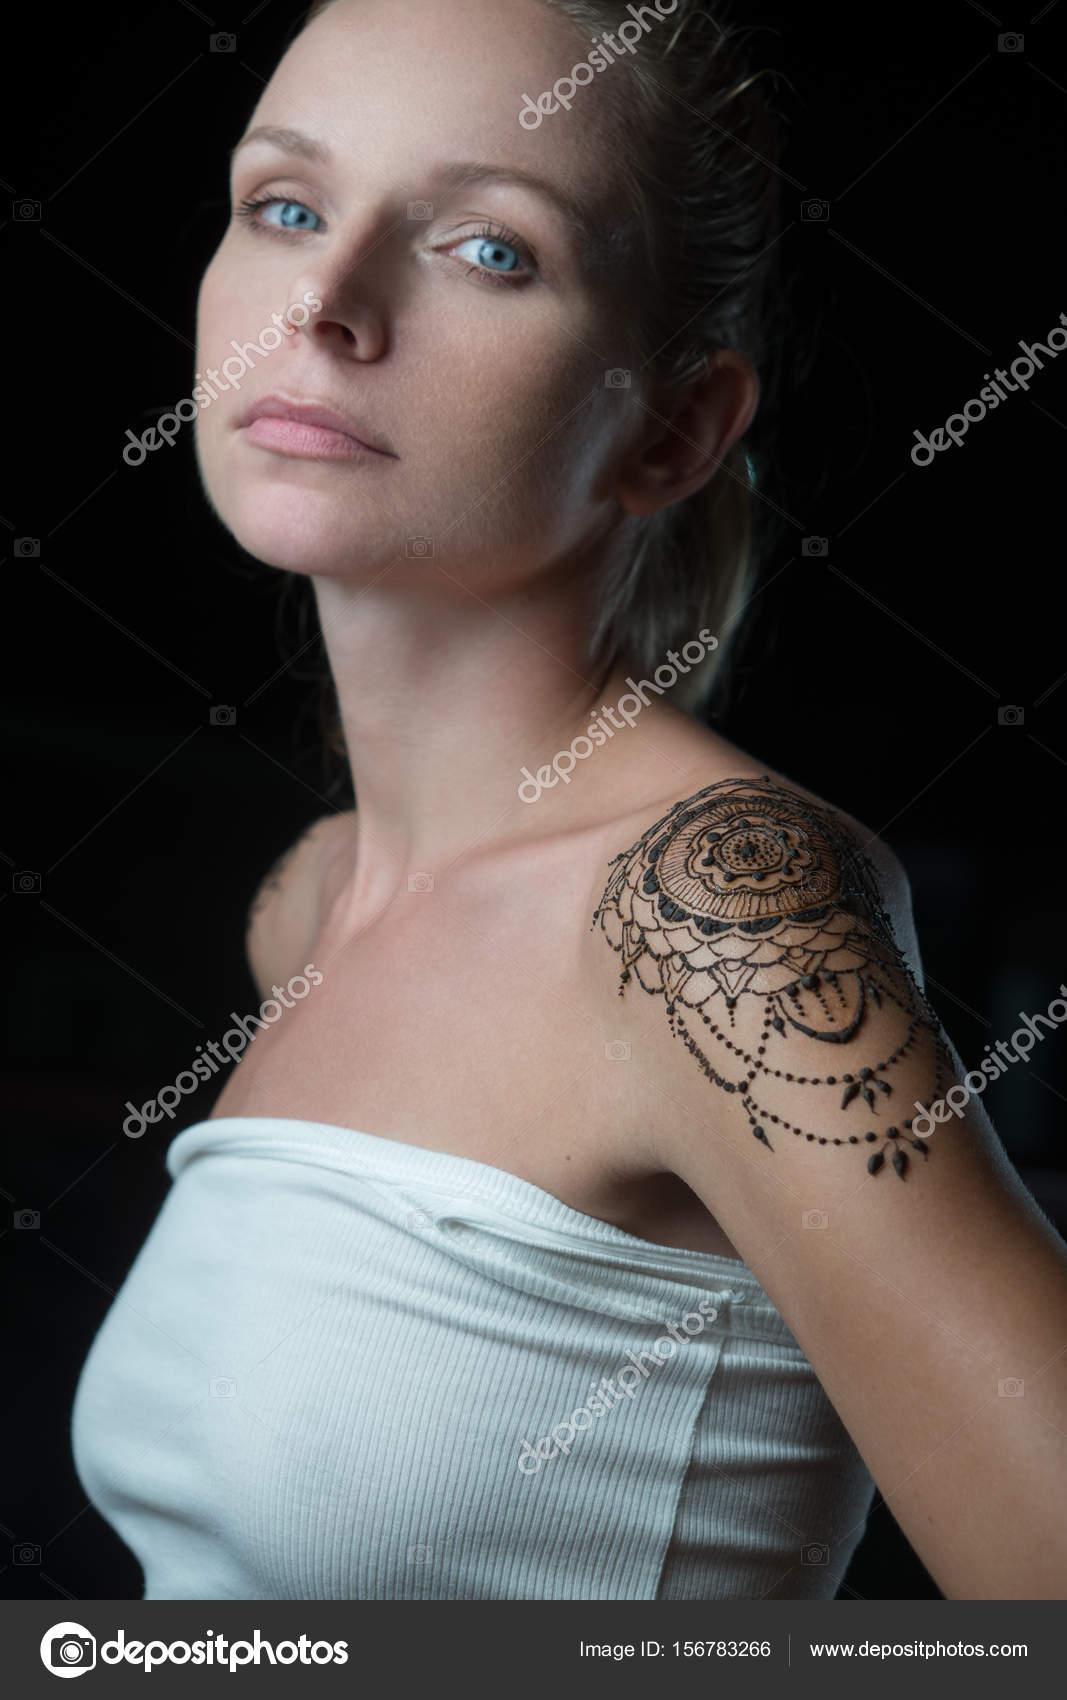 depositphotos_156783266-stock-photo-woman-with-henna-tattoo-on.jpg